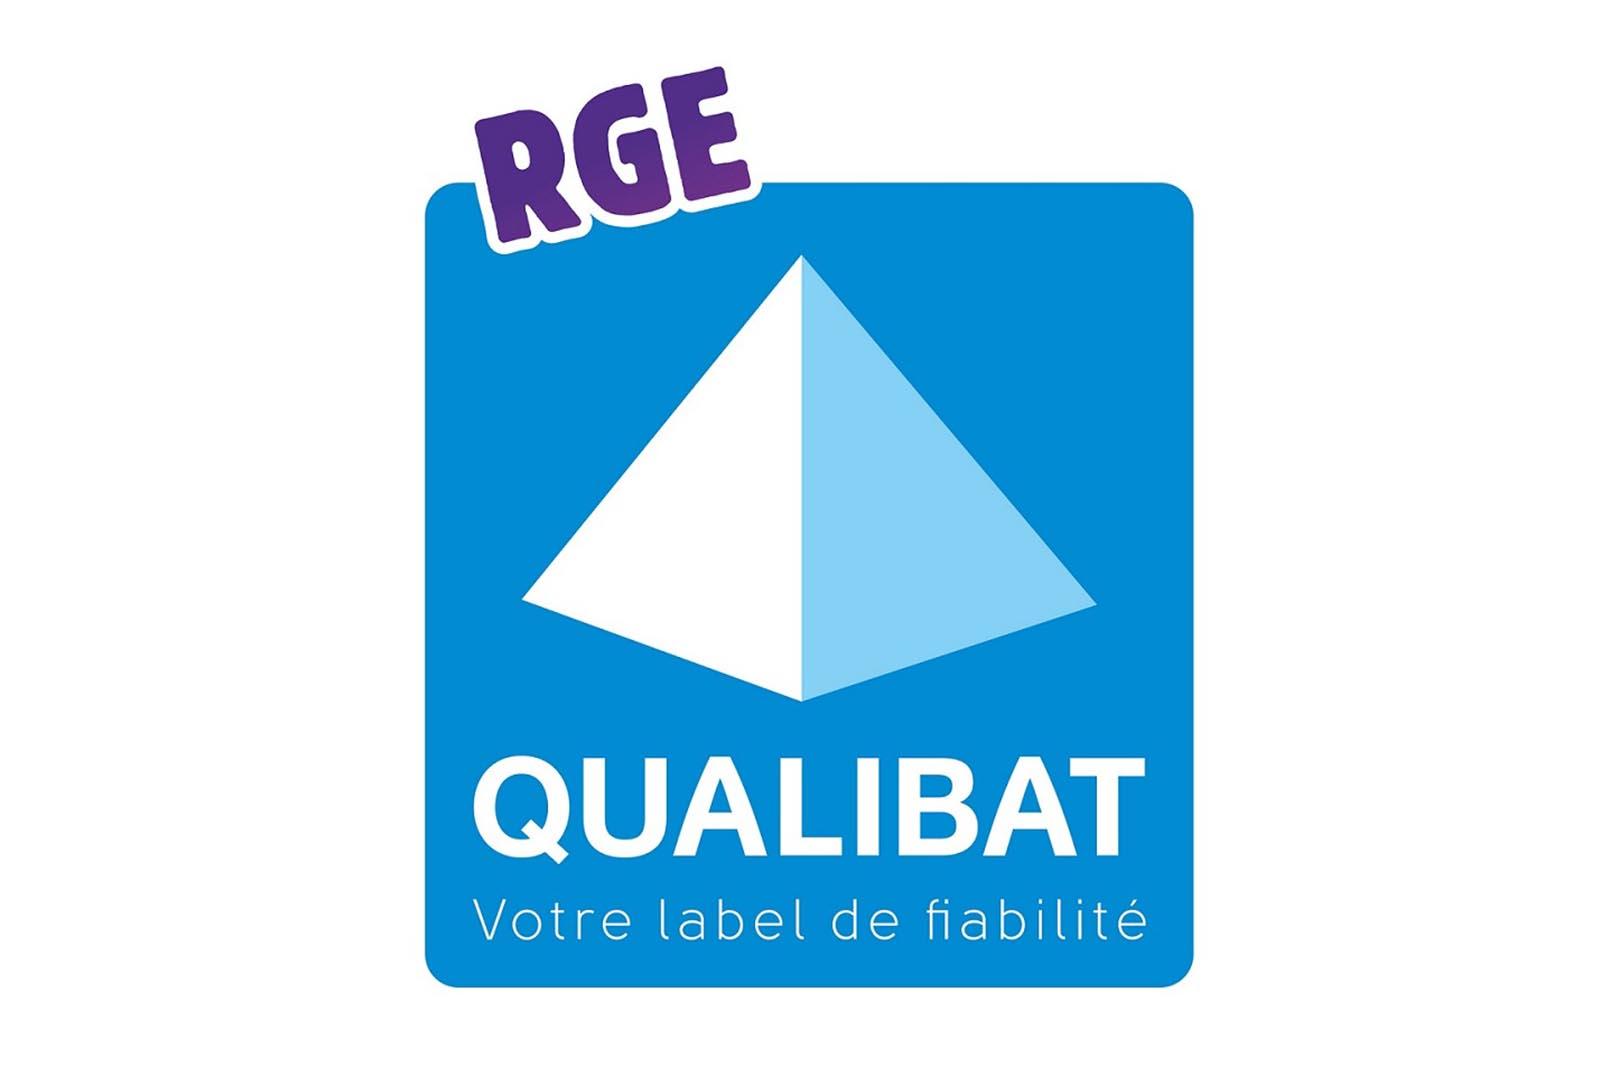 RGE Qualibat, partenaire de RGB